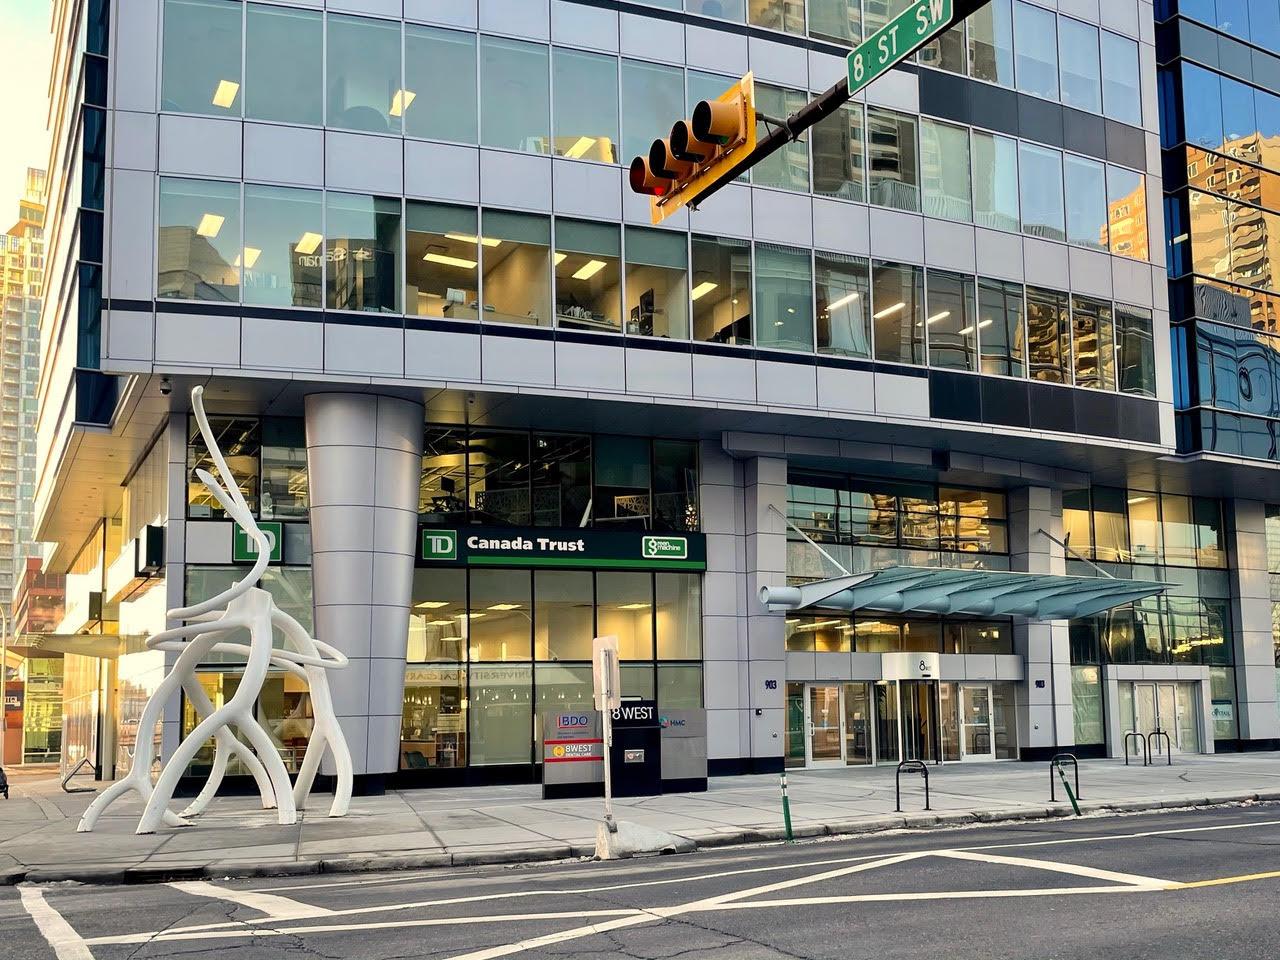 8 West Dental Care outside building